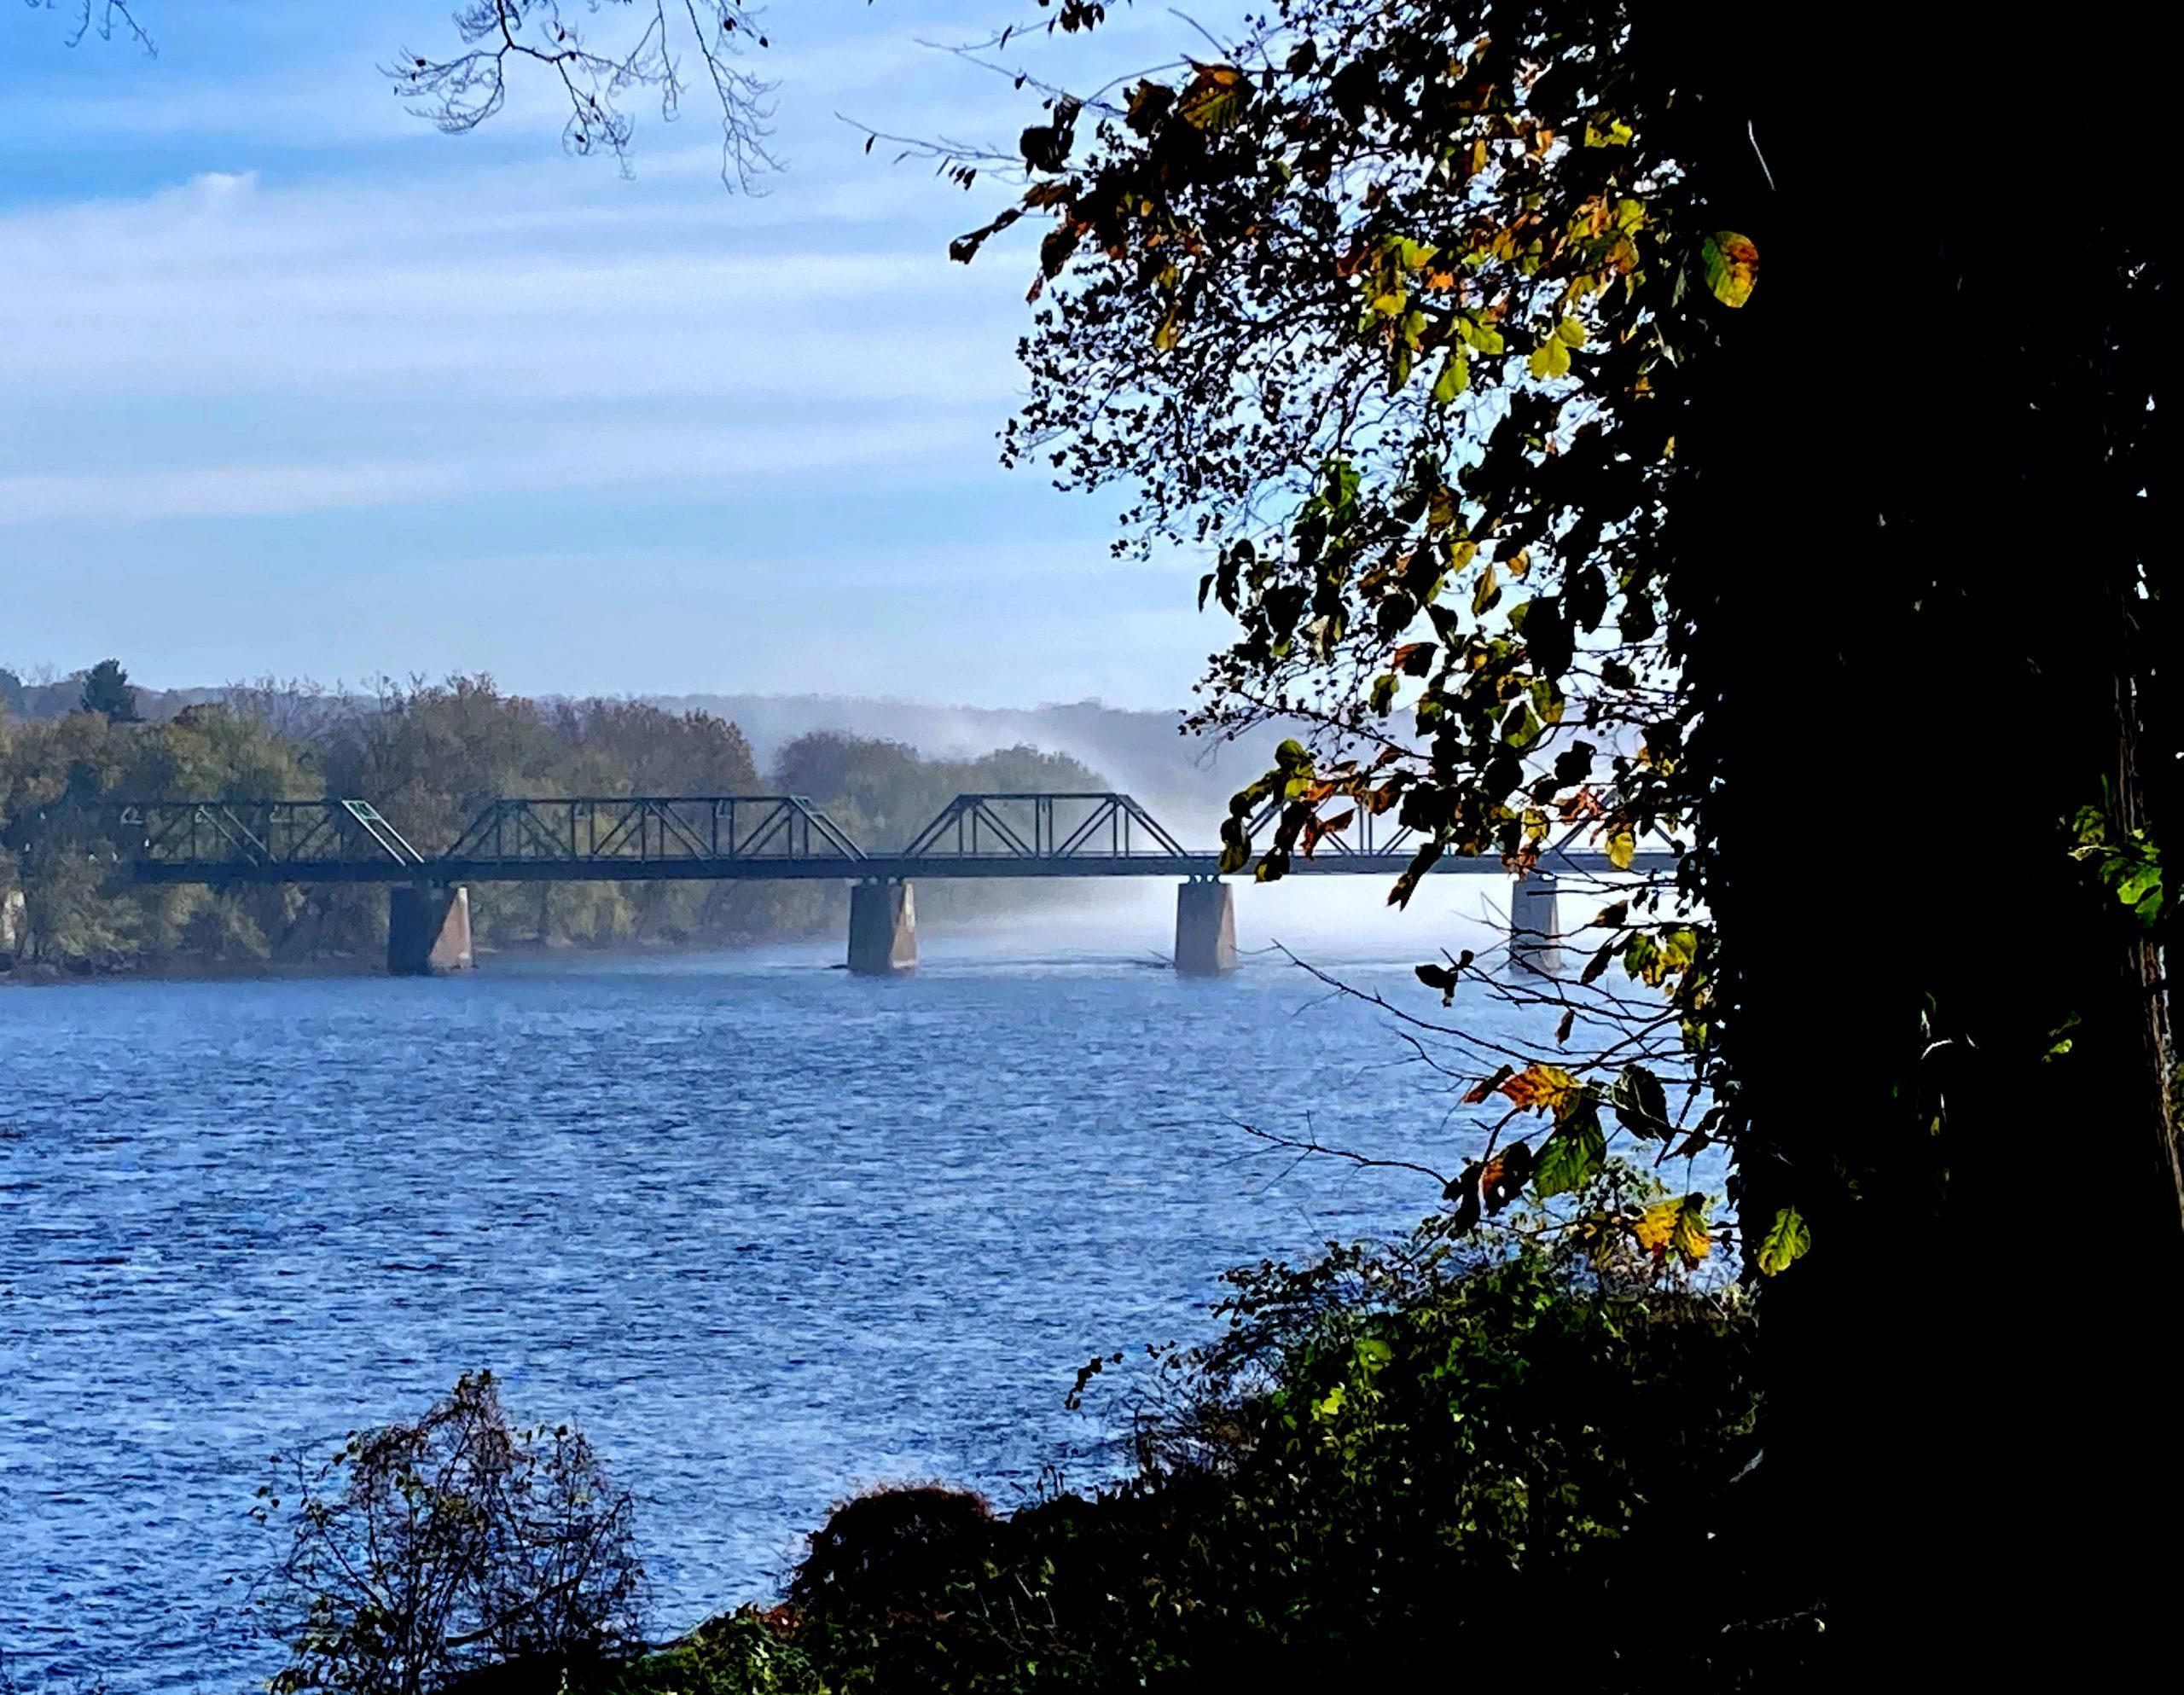 Thanks Giving - Delaware River 11-01-20 01 Center Bridge Stockton Bridge with mist 02